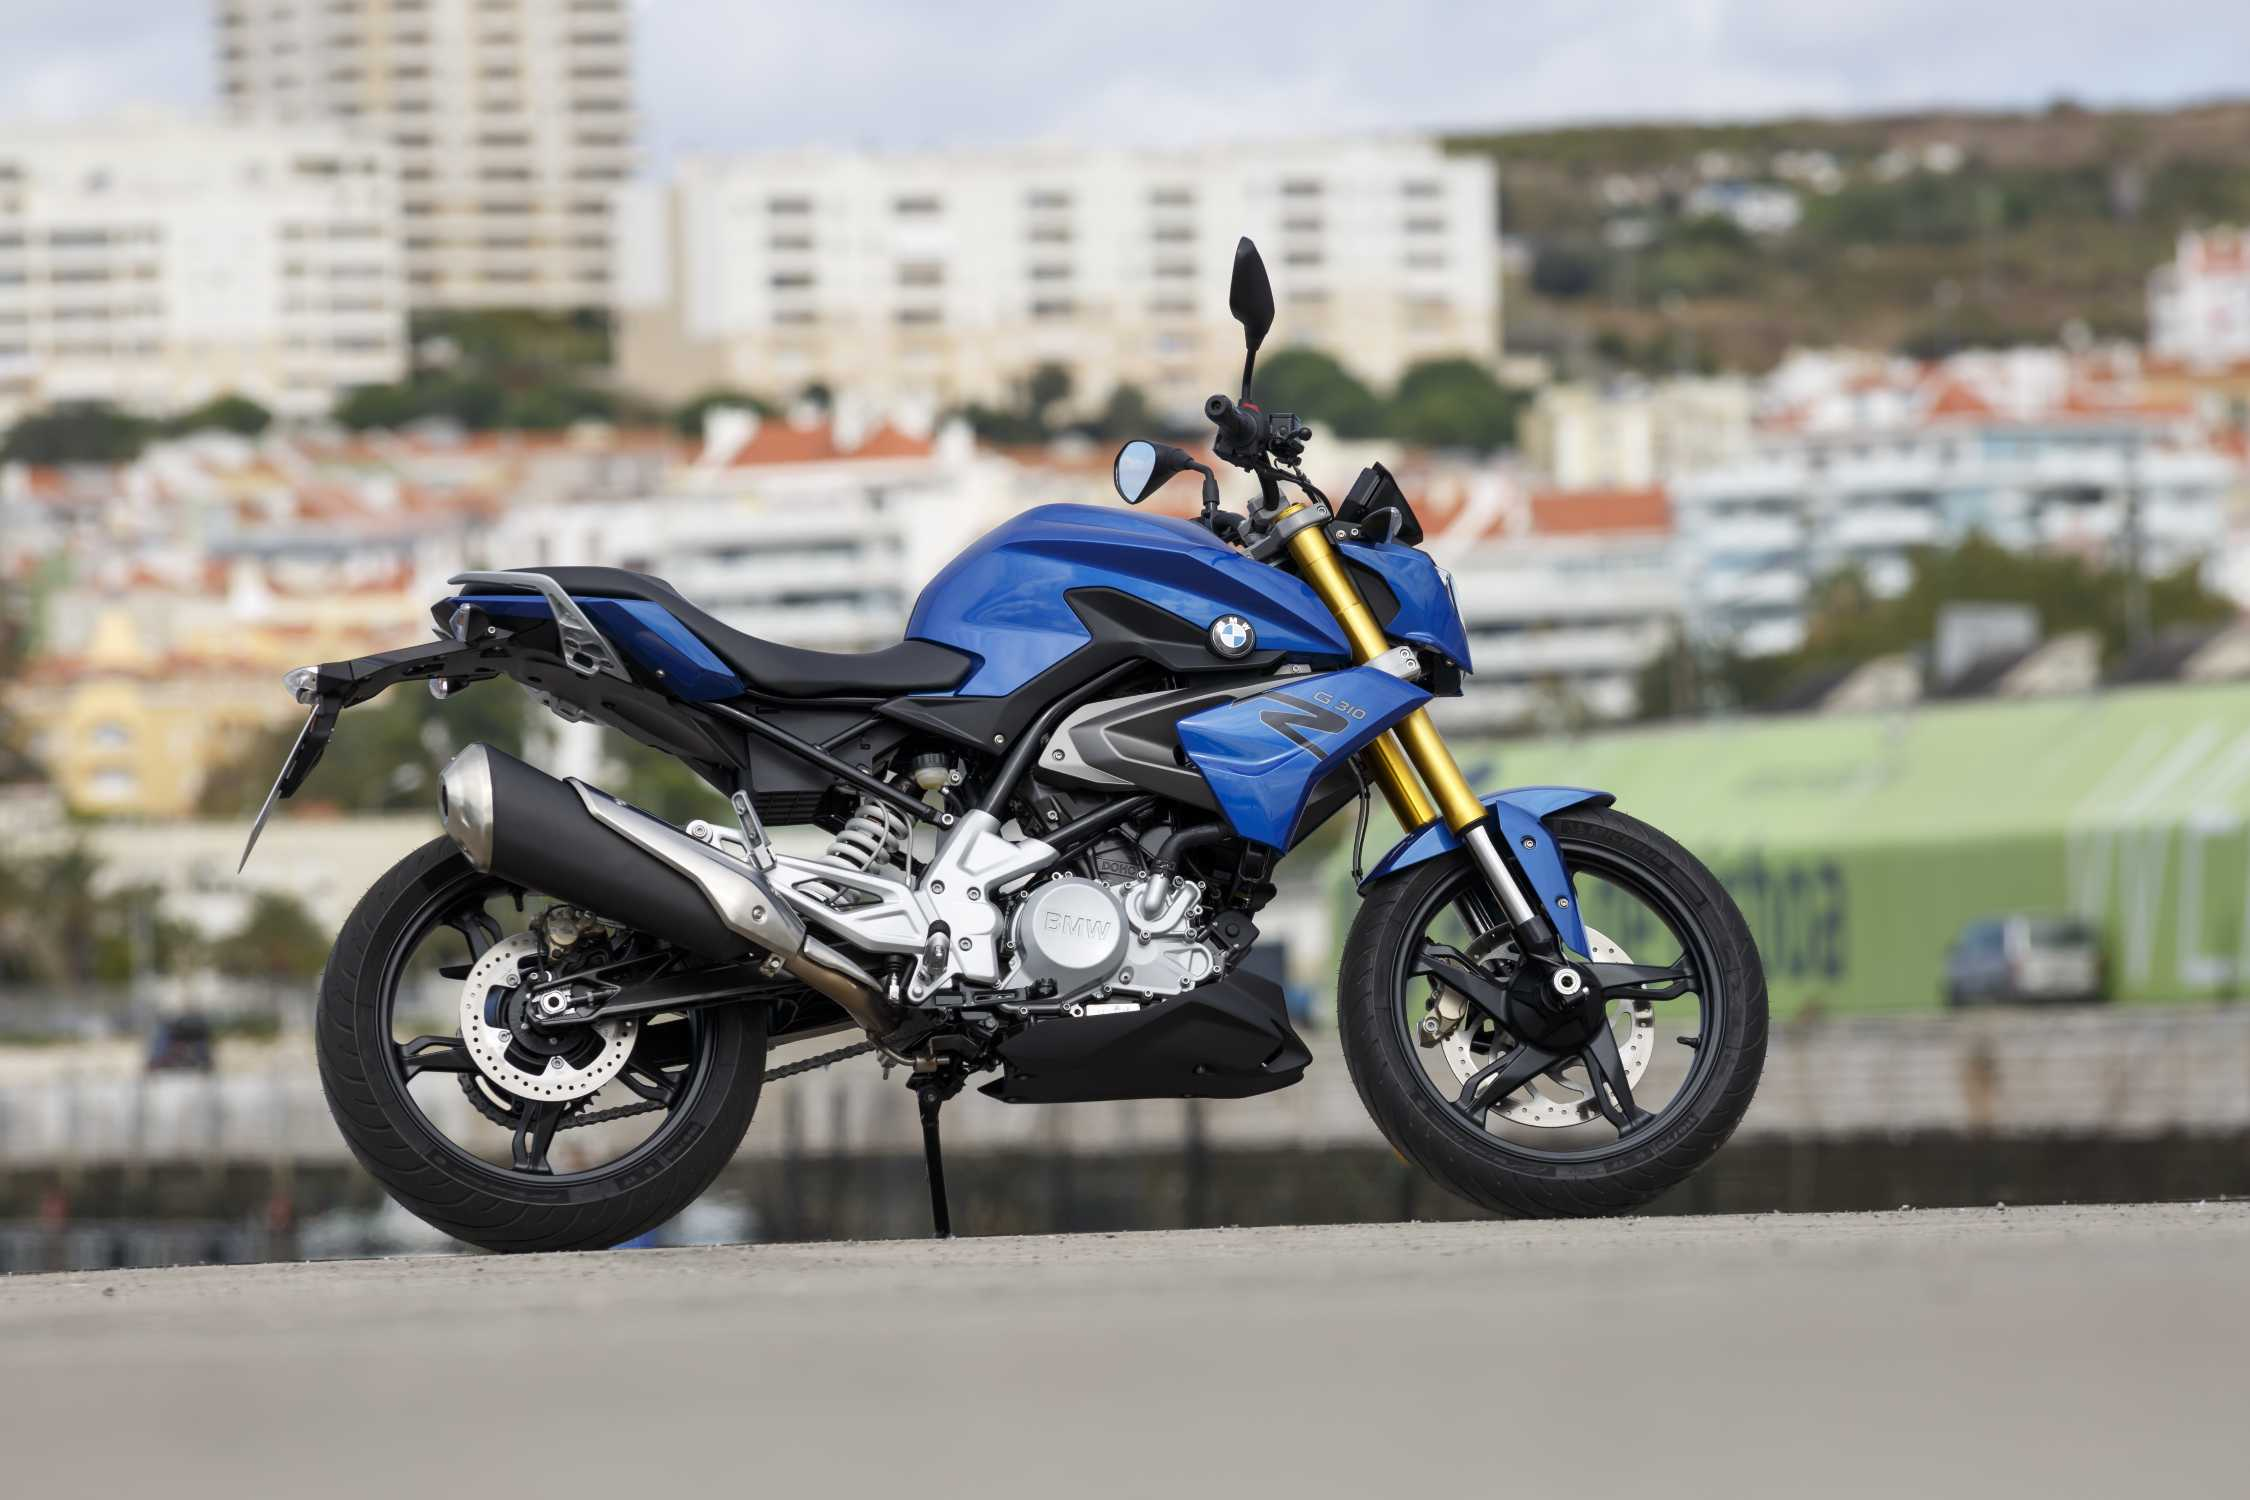 Мотоцикл BMW G 310 R - universalmotors.ru